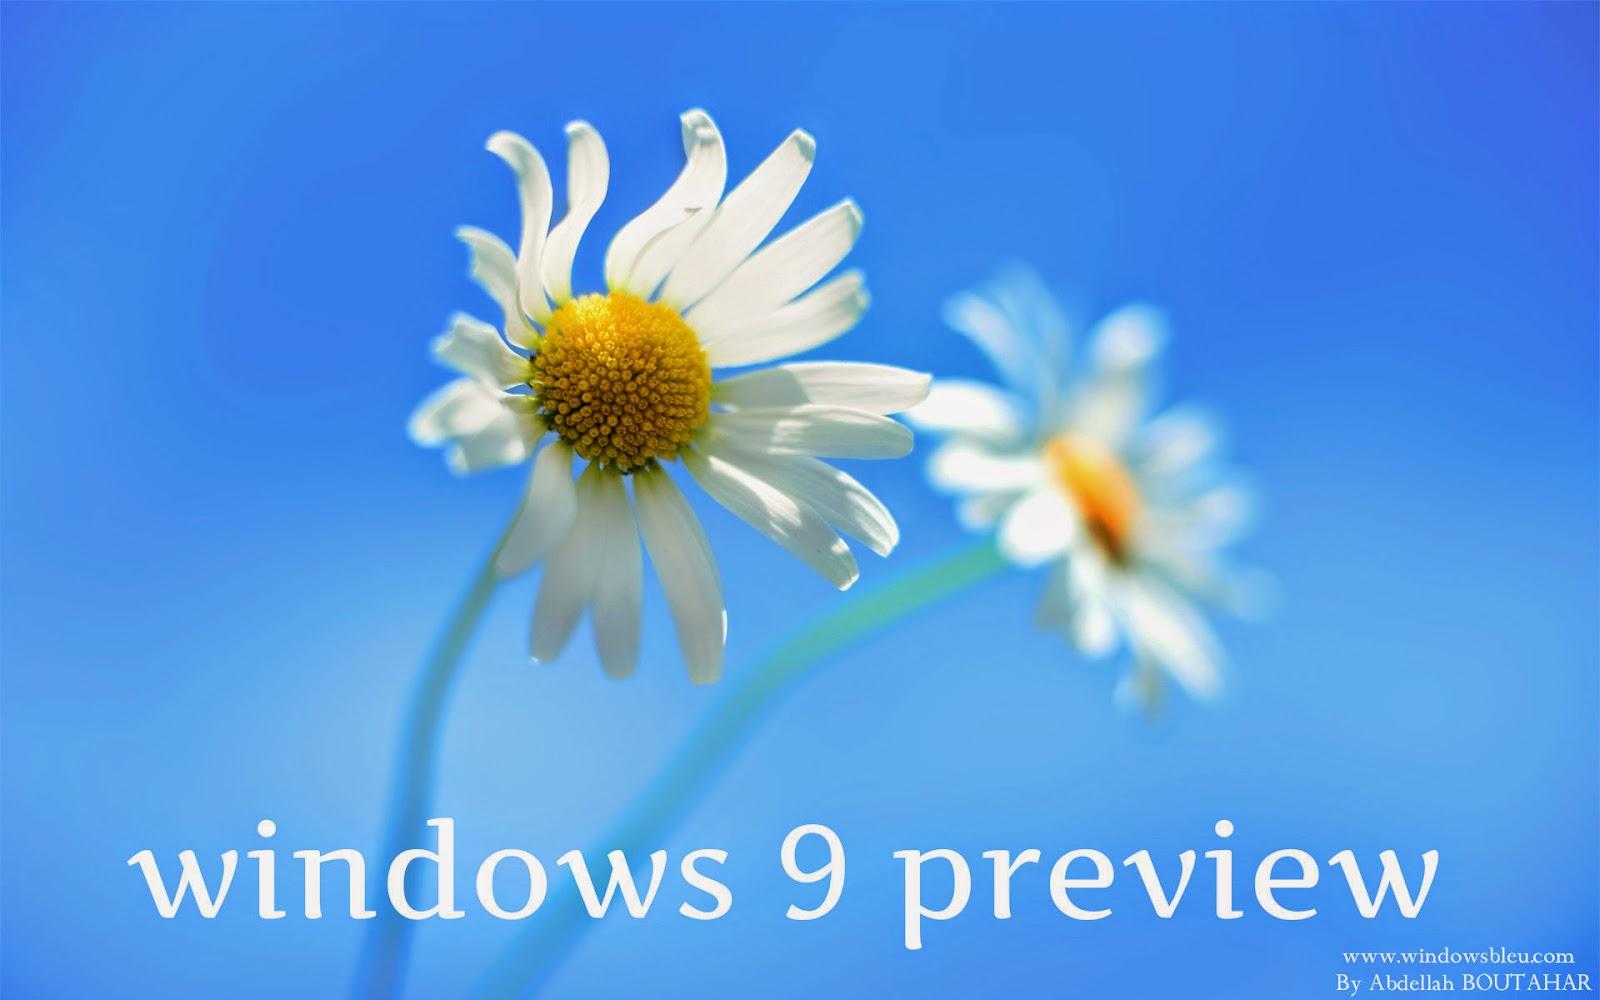 windows 9 preview release date   Windows Blue full - Windows 10